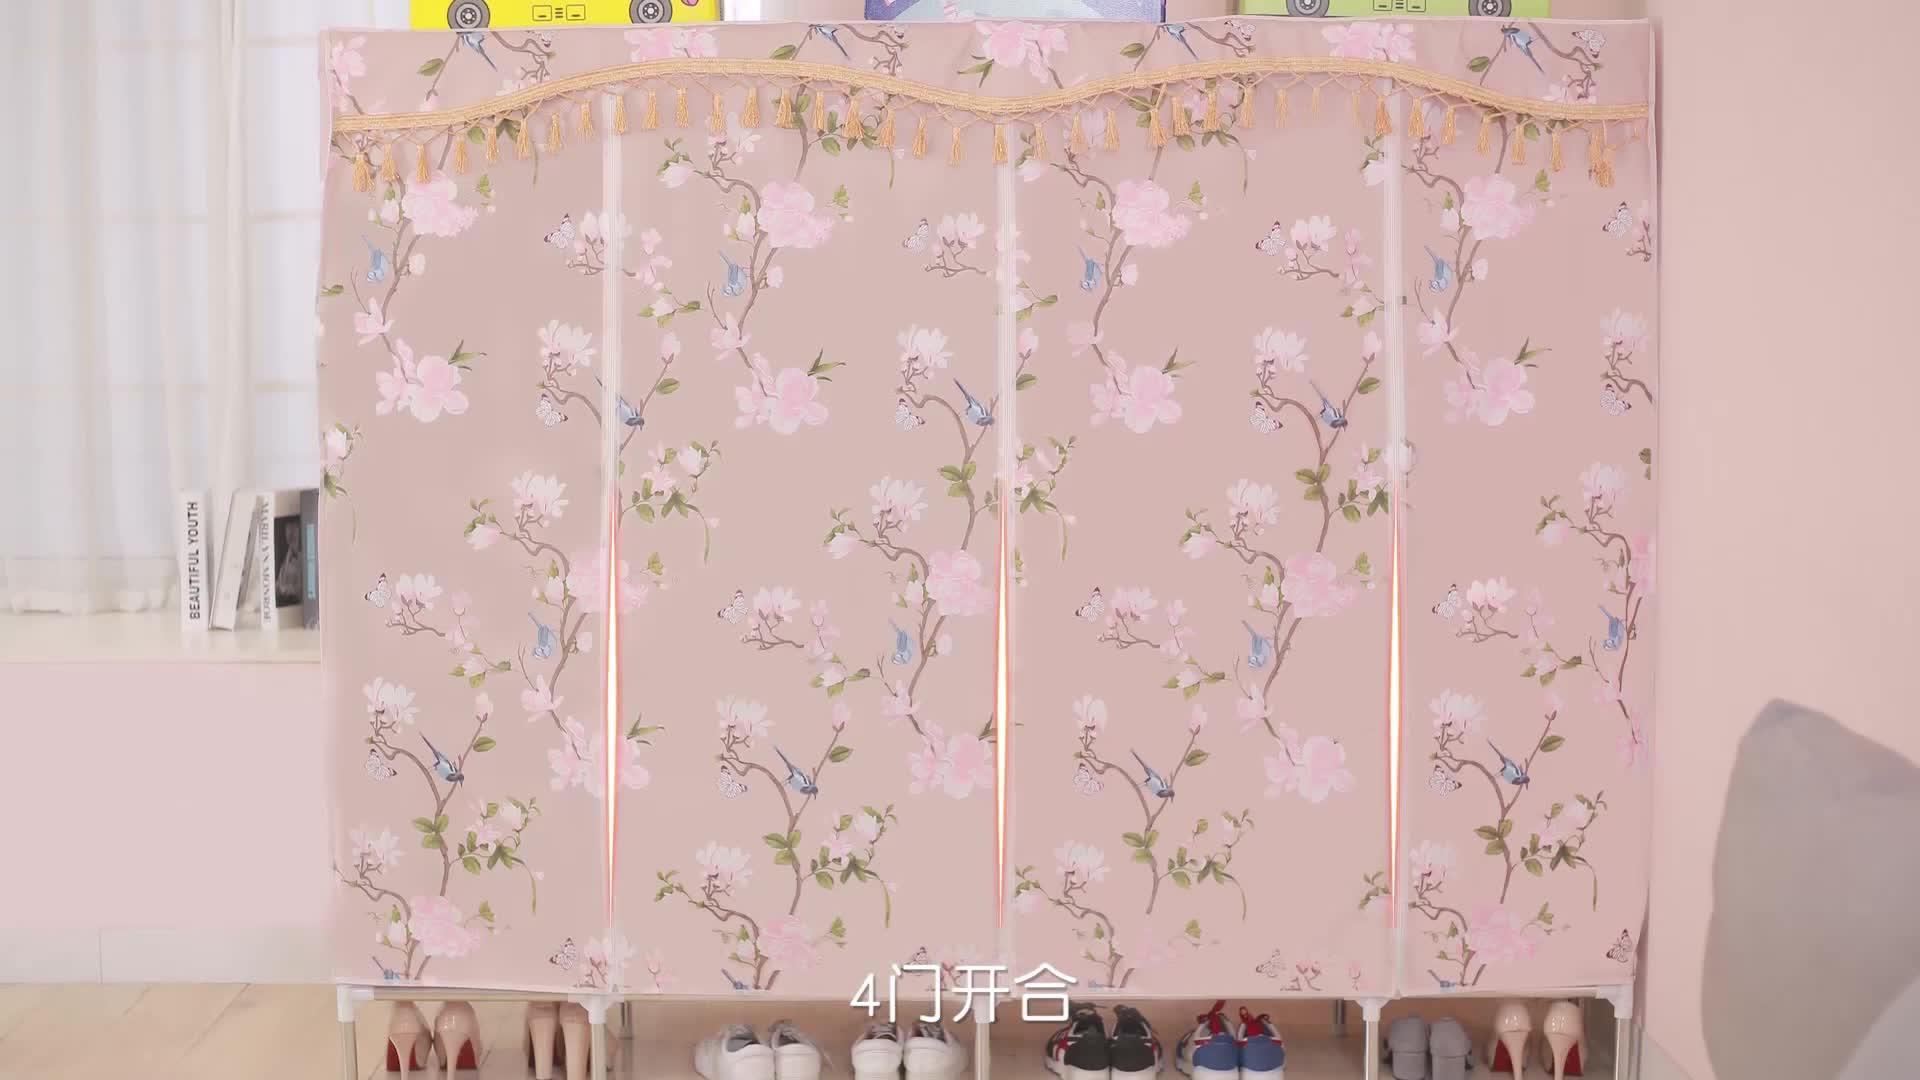 168*45*168CM size folding fabric plastic wardrobe bedroom closet cabinet steel frame C1703